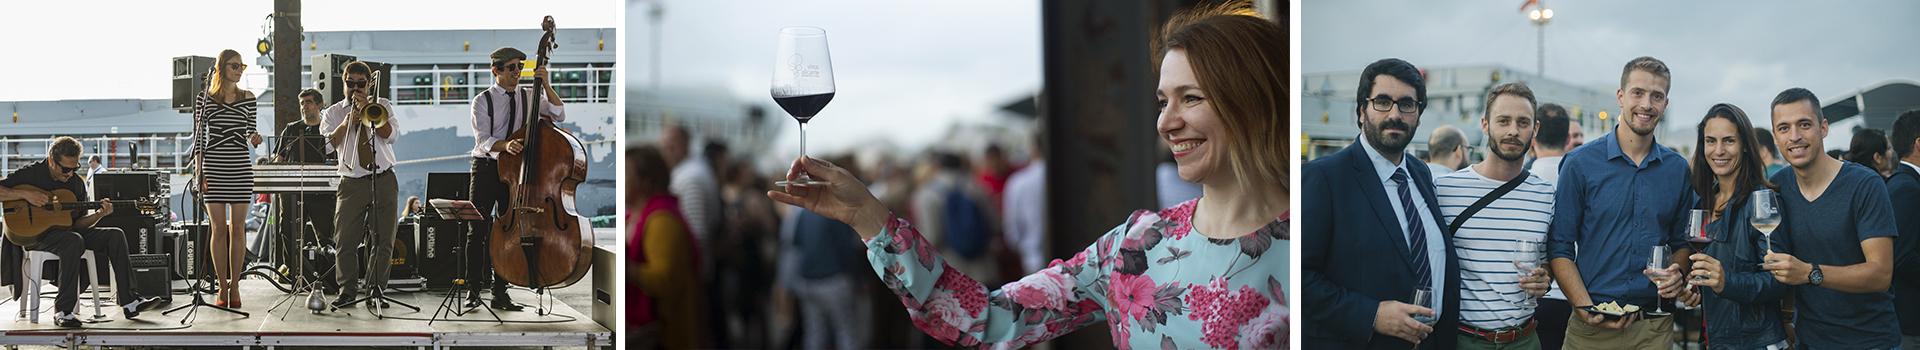 winecanting puerto